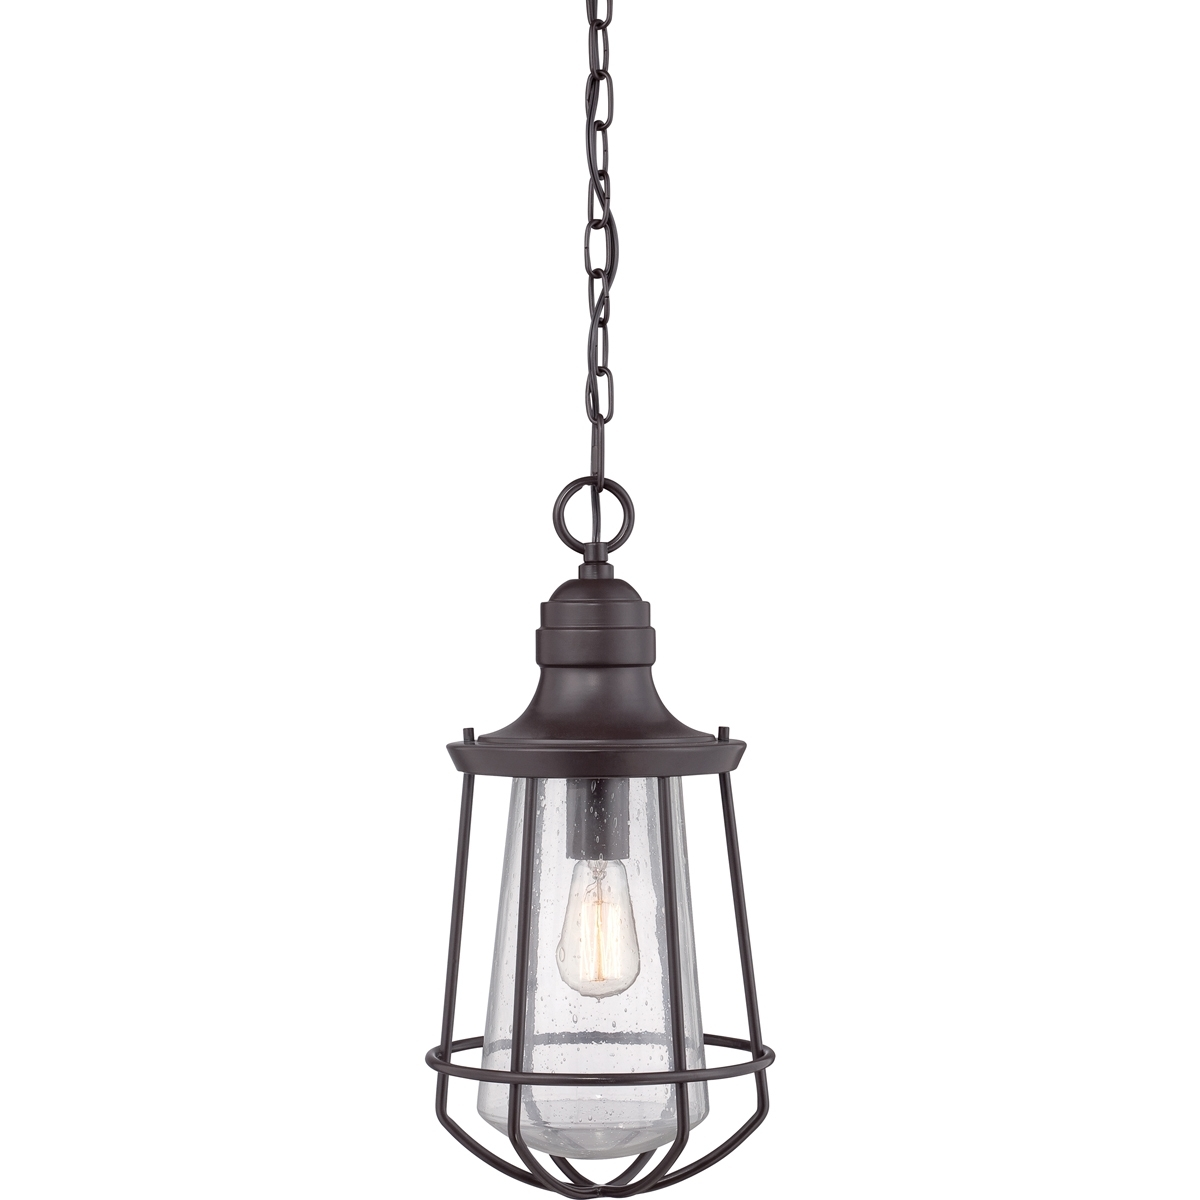 Outdoor Hanging Light Fixtures Trends And Industrial Lights Pictures For Latest Outdoor Hanging Lighting Fixtures (View 9 of 20)